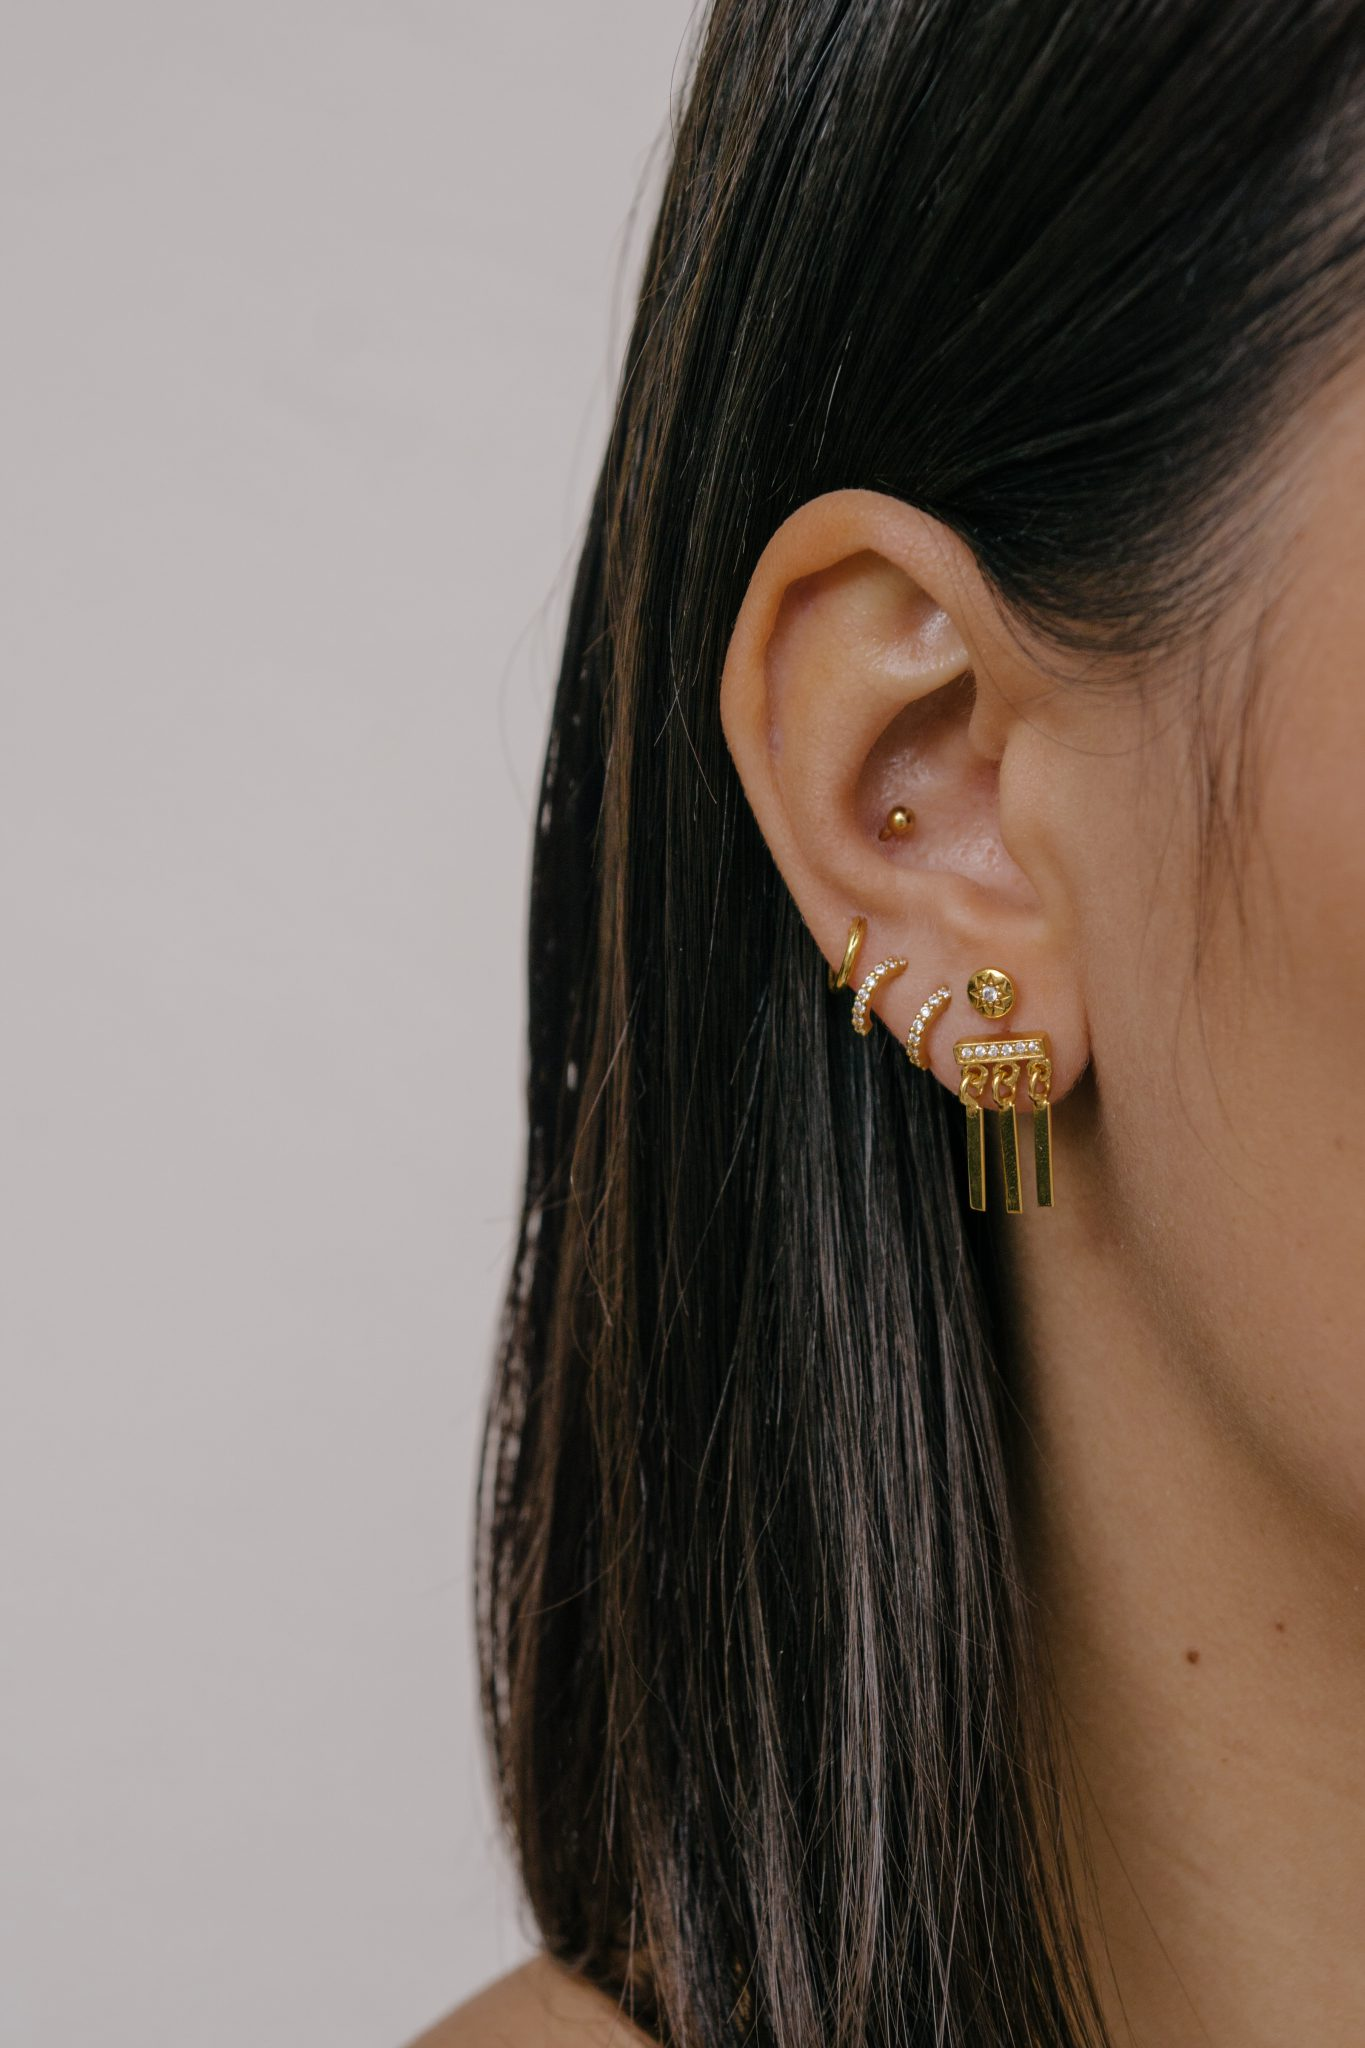 cf9a341e2 Zirconia hoops gold – silver – P'tite Folie